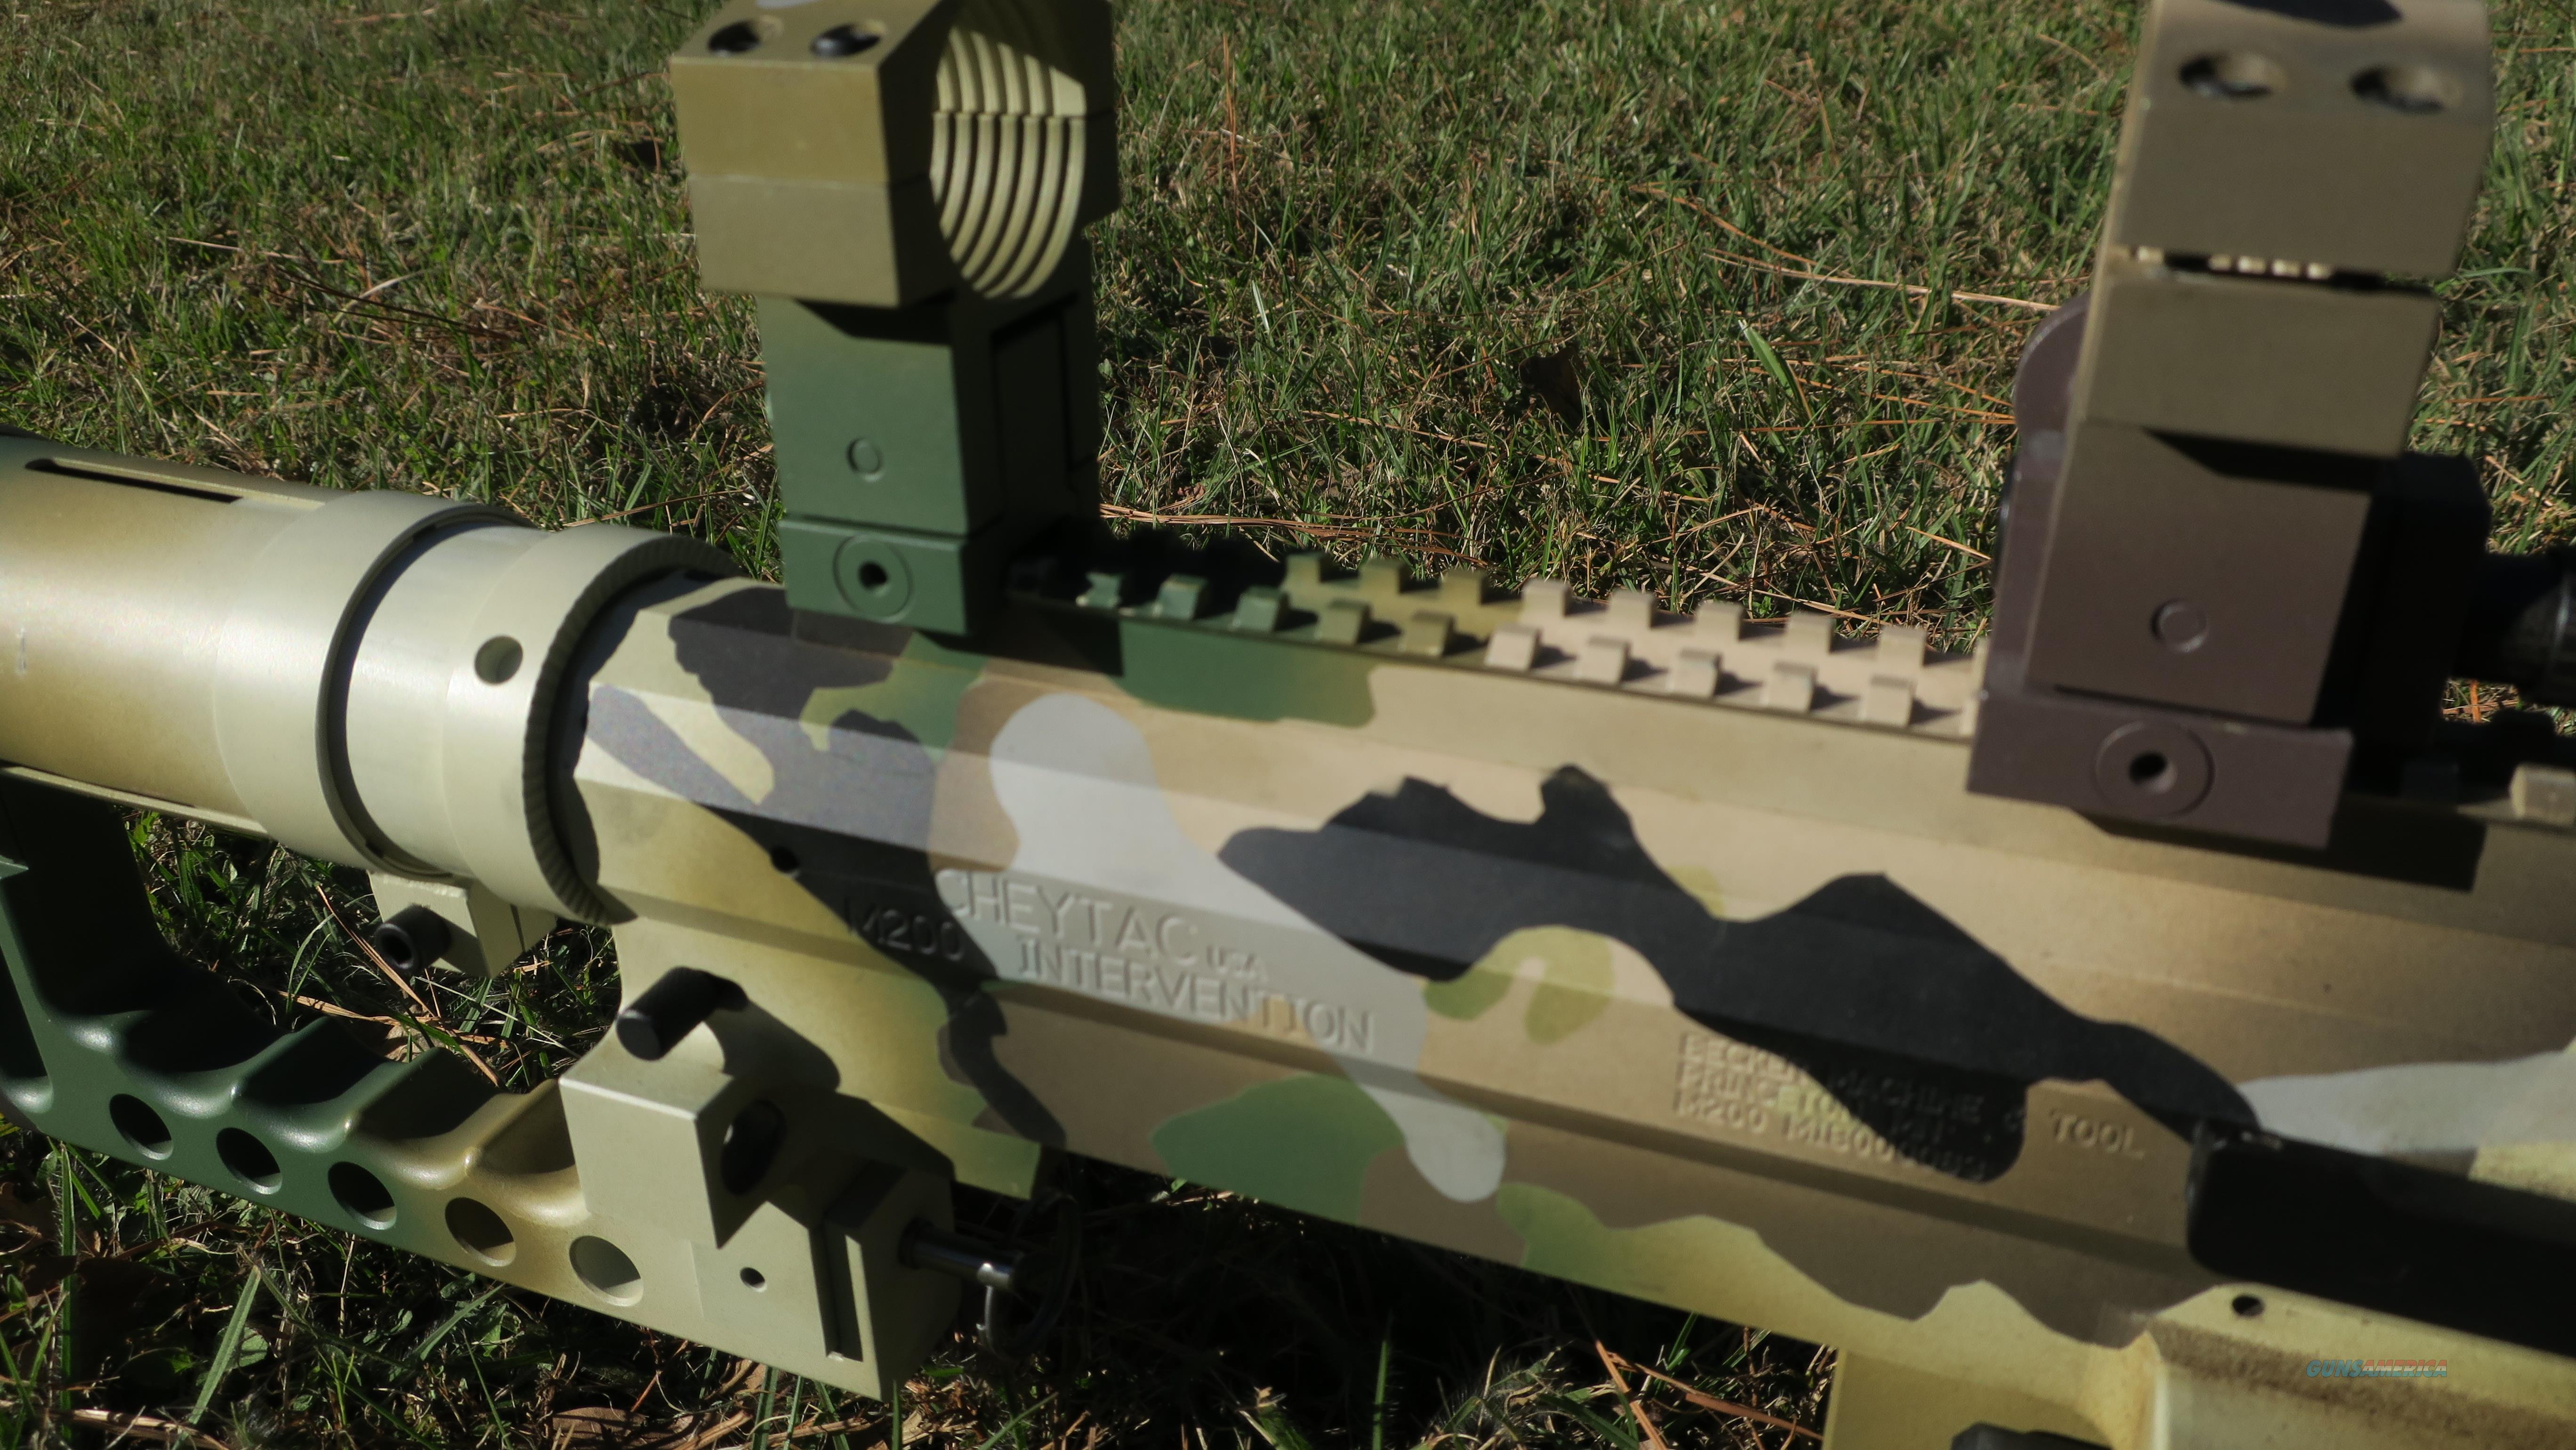 Cheytac M200 Intervention 375 Cheytac Sniper Rifle